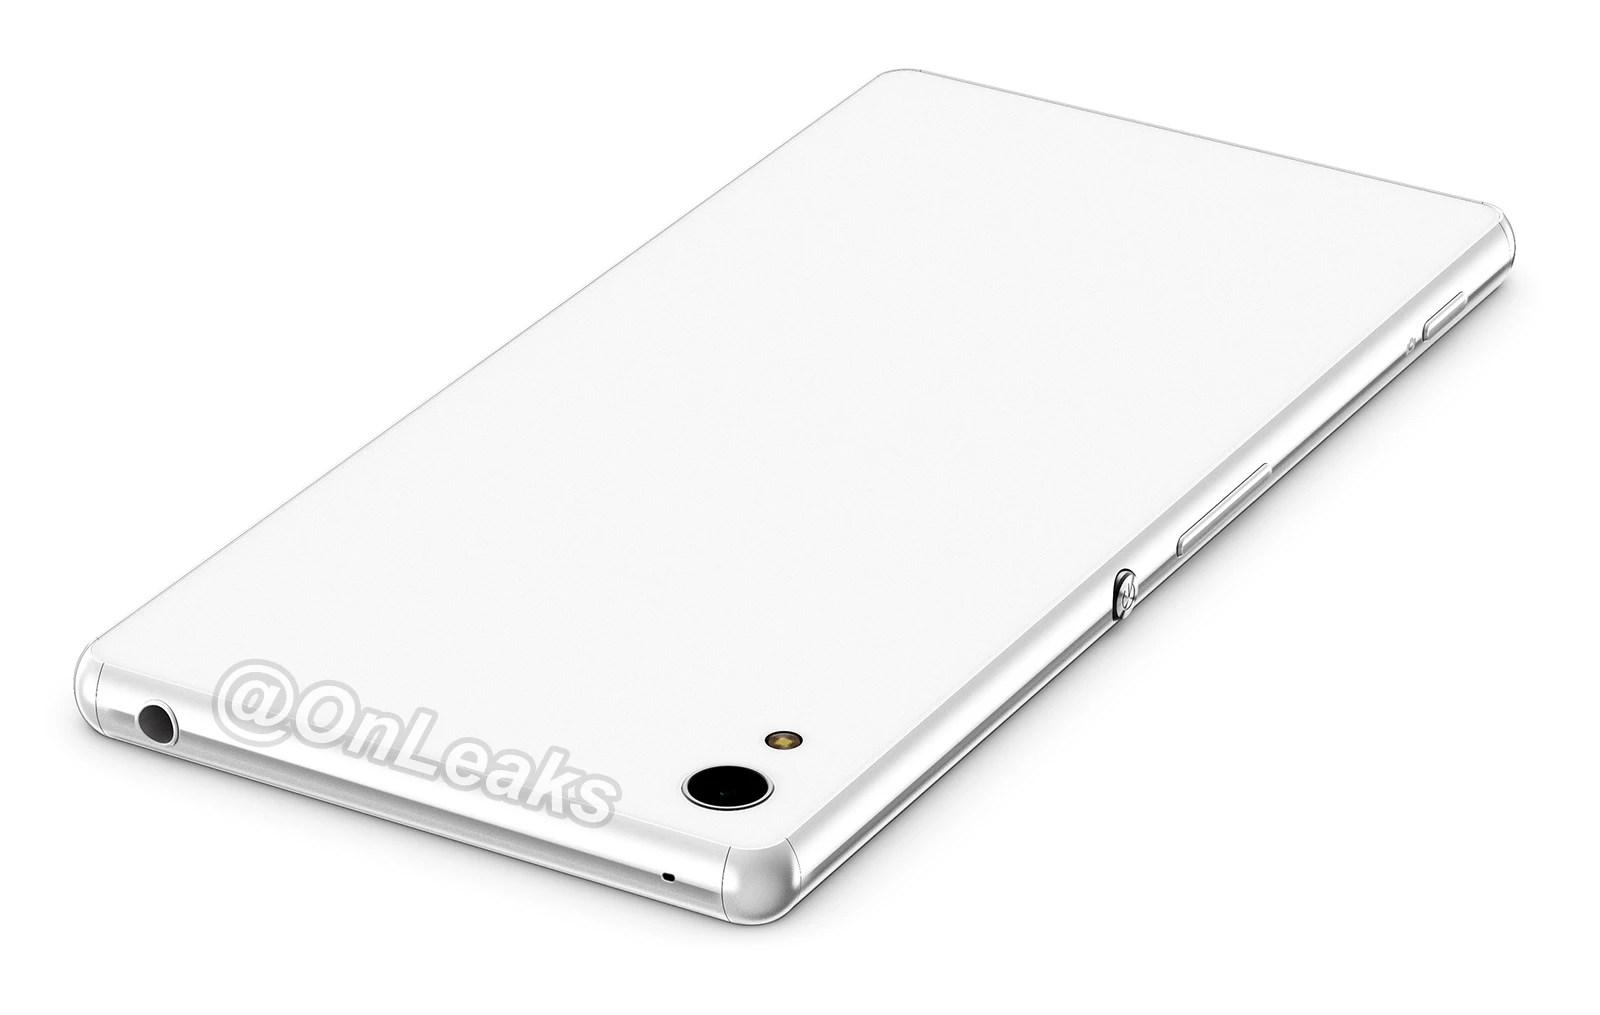 Sony Xperia Z4 rumor round-up: price, specs, release date